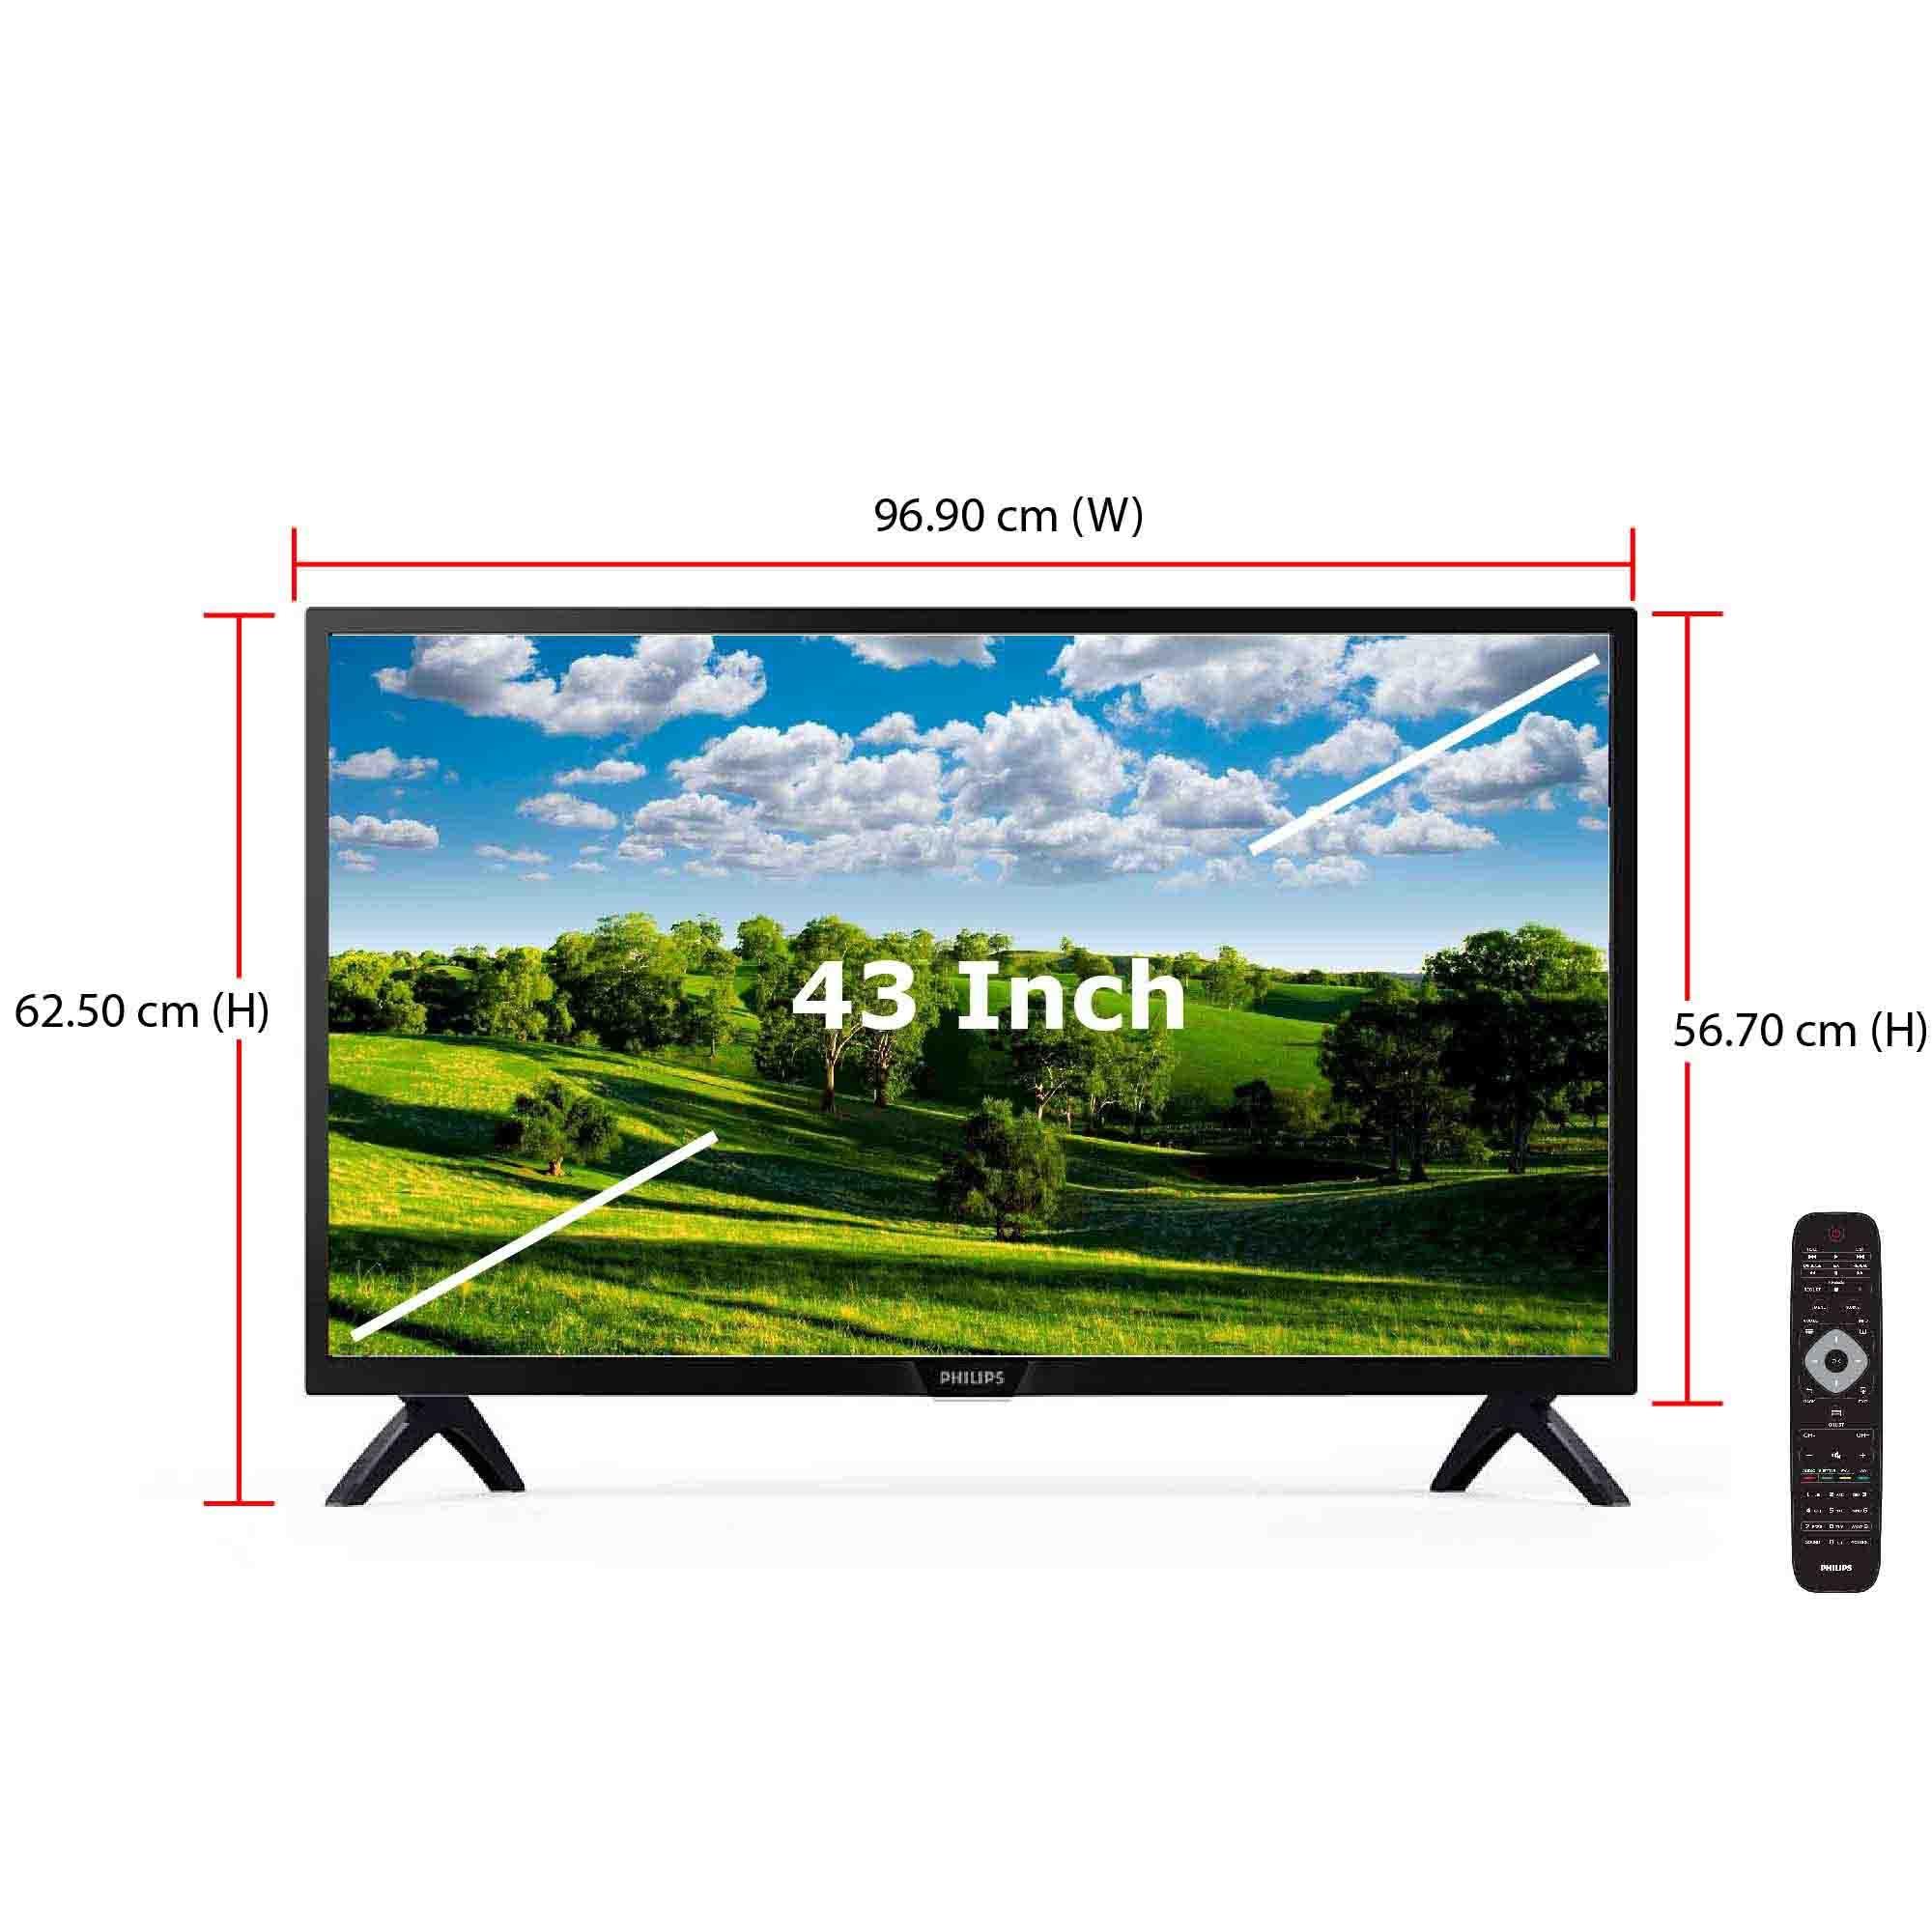 philips tv 43pft4002 43 inch vga end 3 12 2021 12 00 am. Black Bedroom Furniture Sets. Home Design Ideas